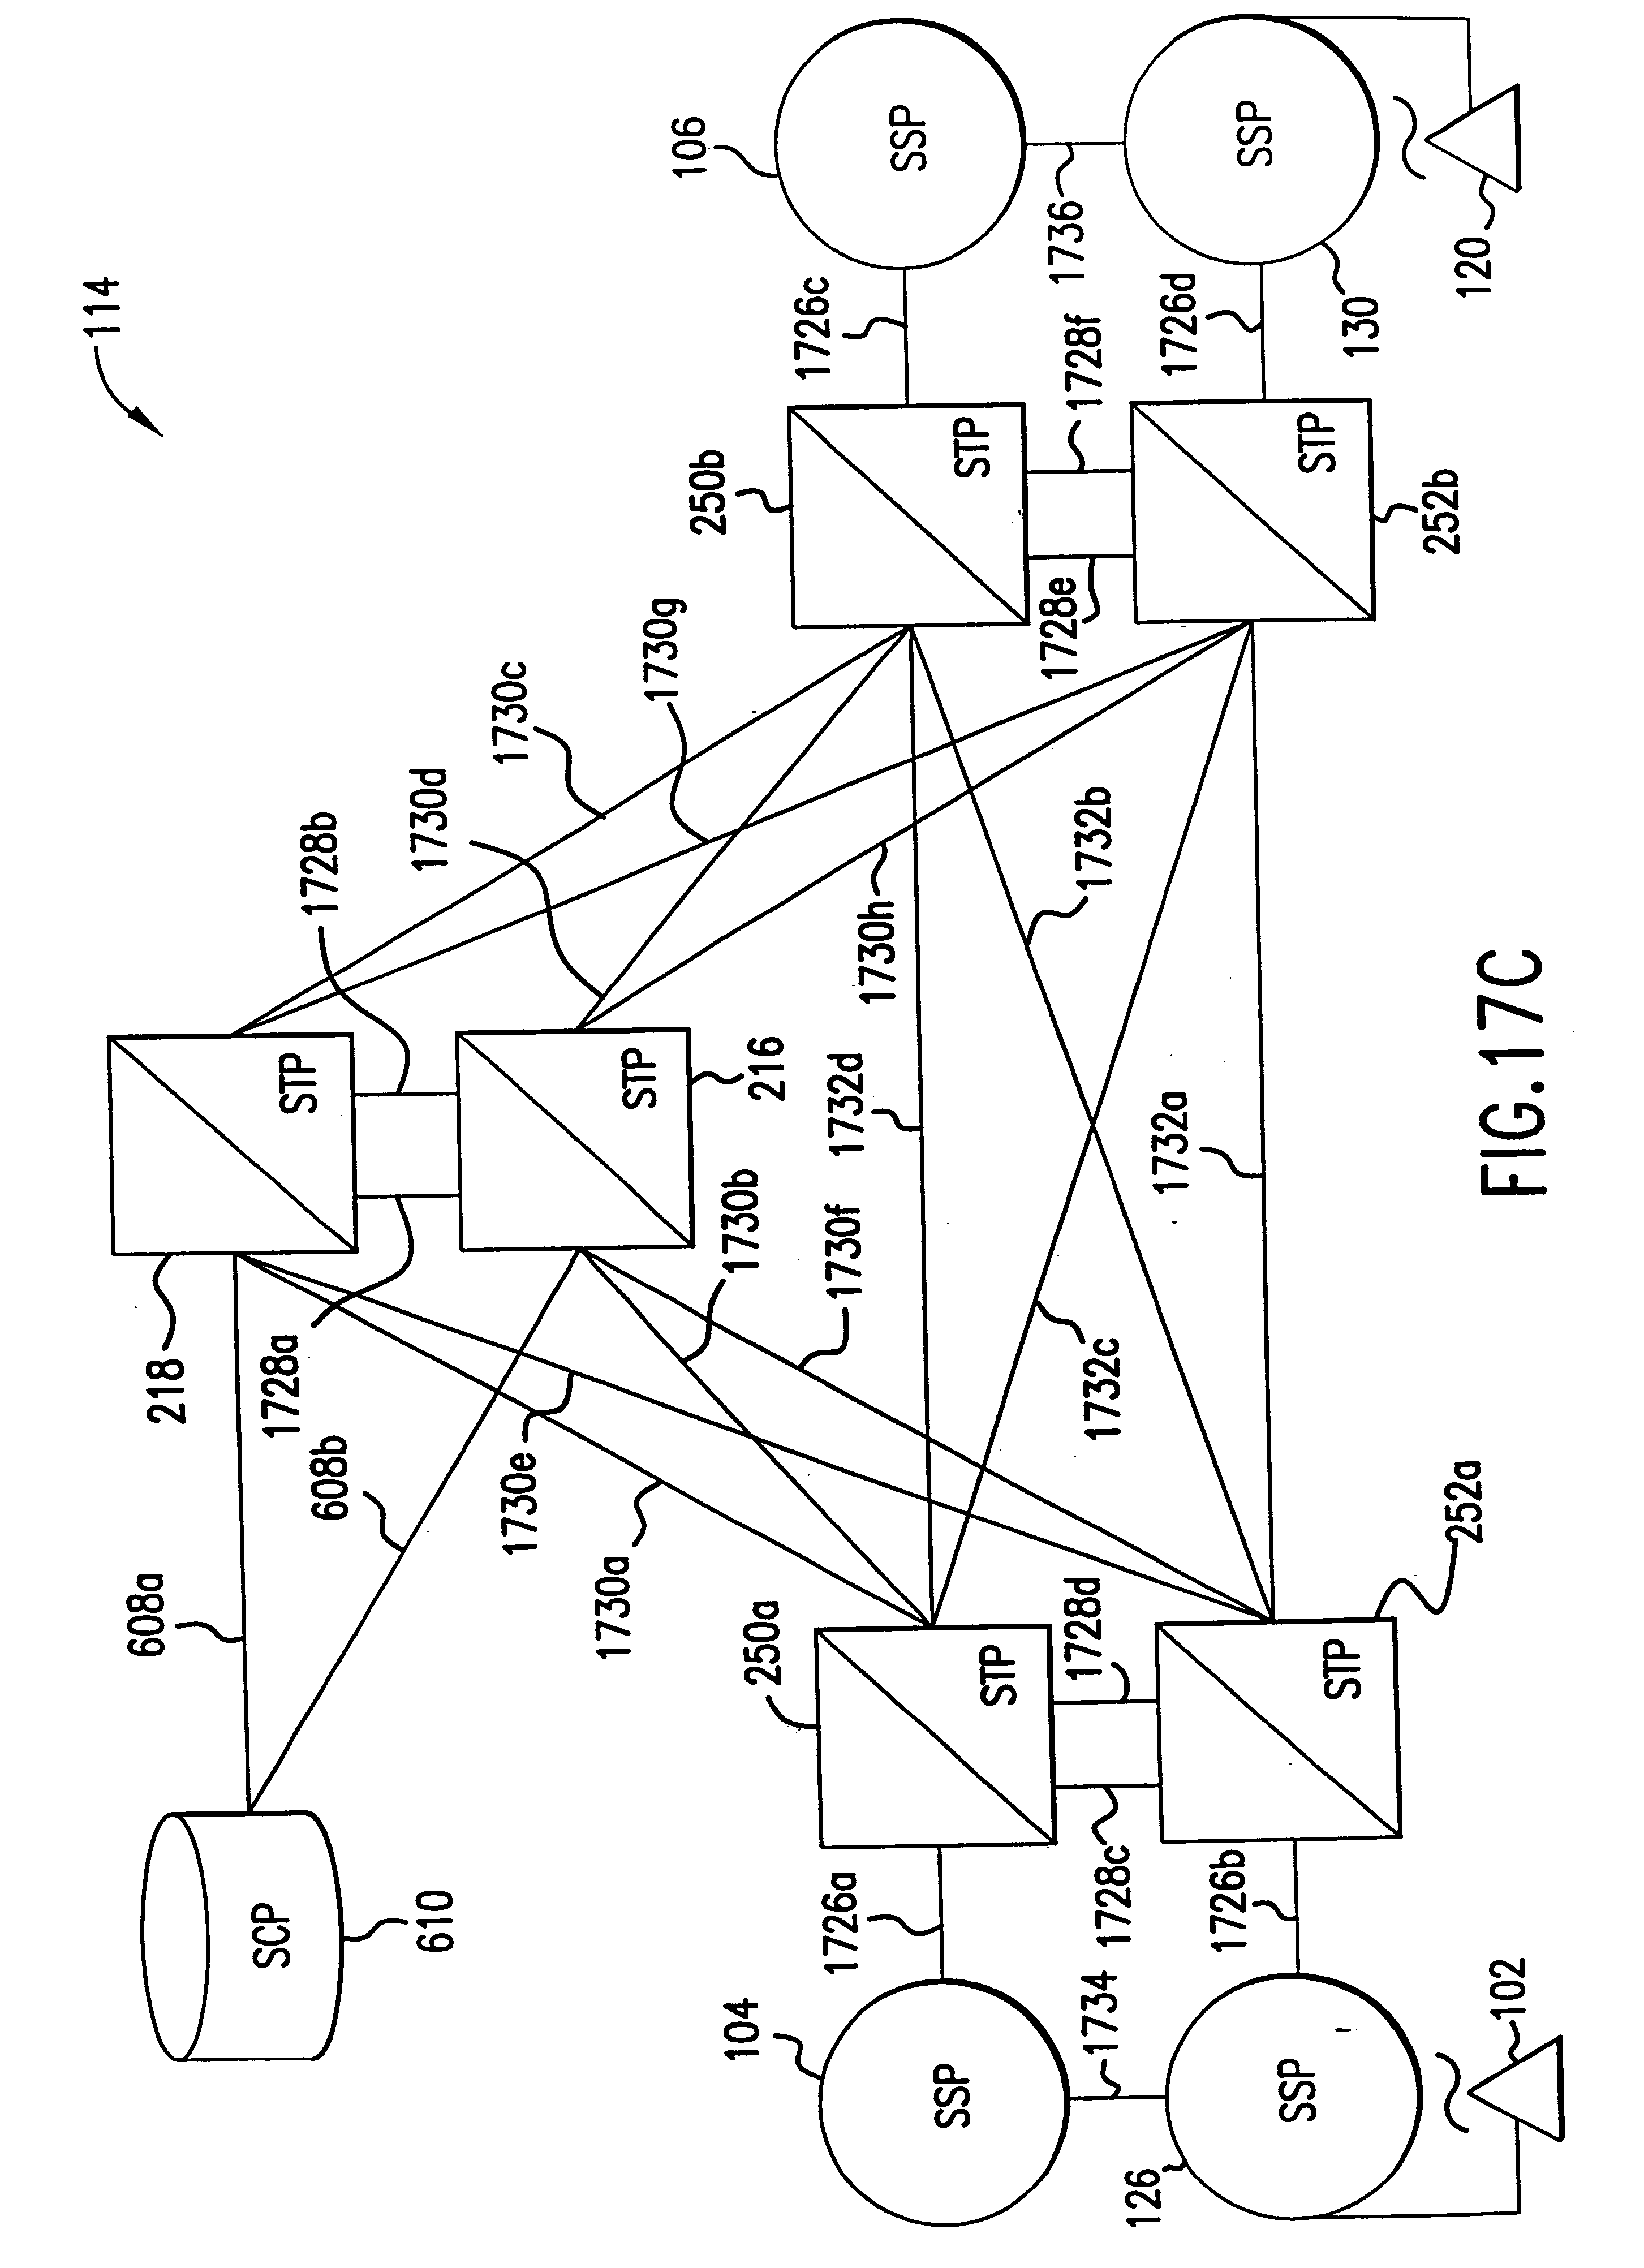 gfc wiring wiring diagram database  gfc alarm wiring diagram database leviton gfci wiring diagram gfc wiring